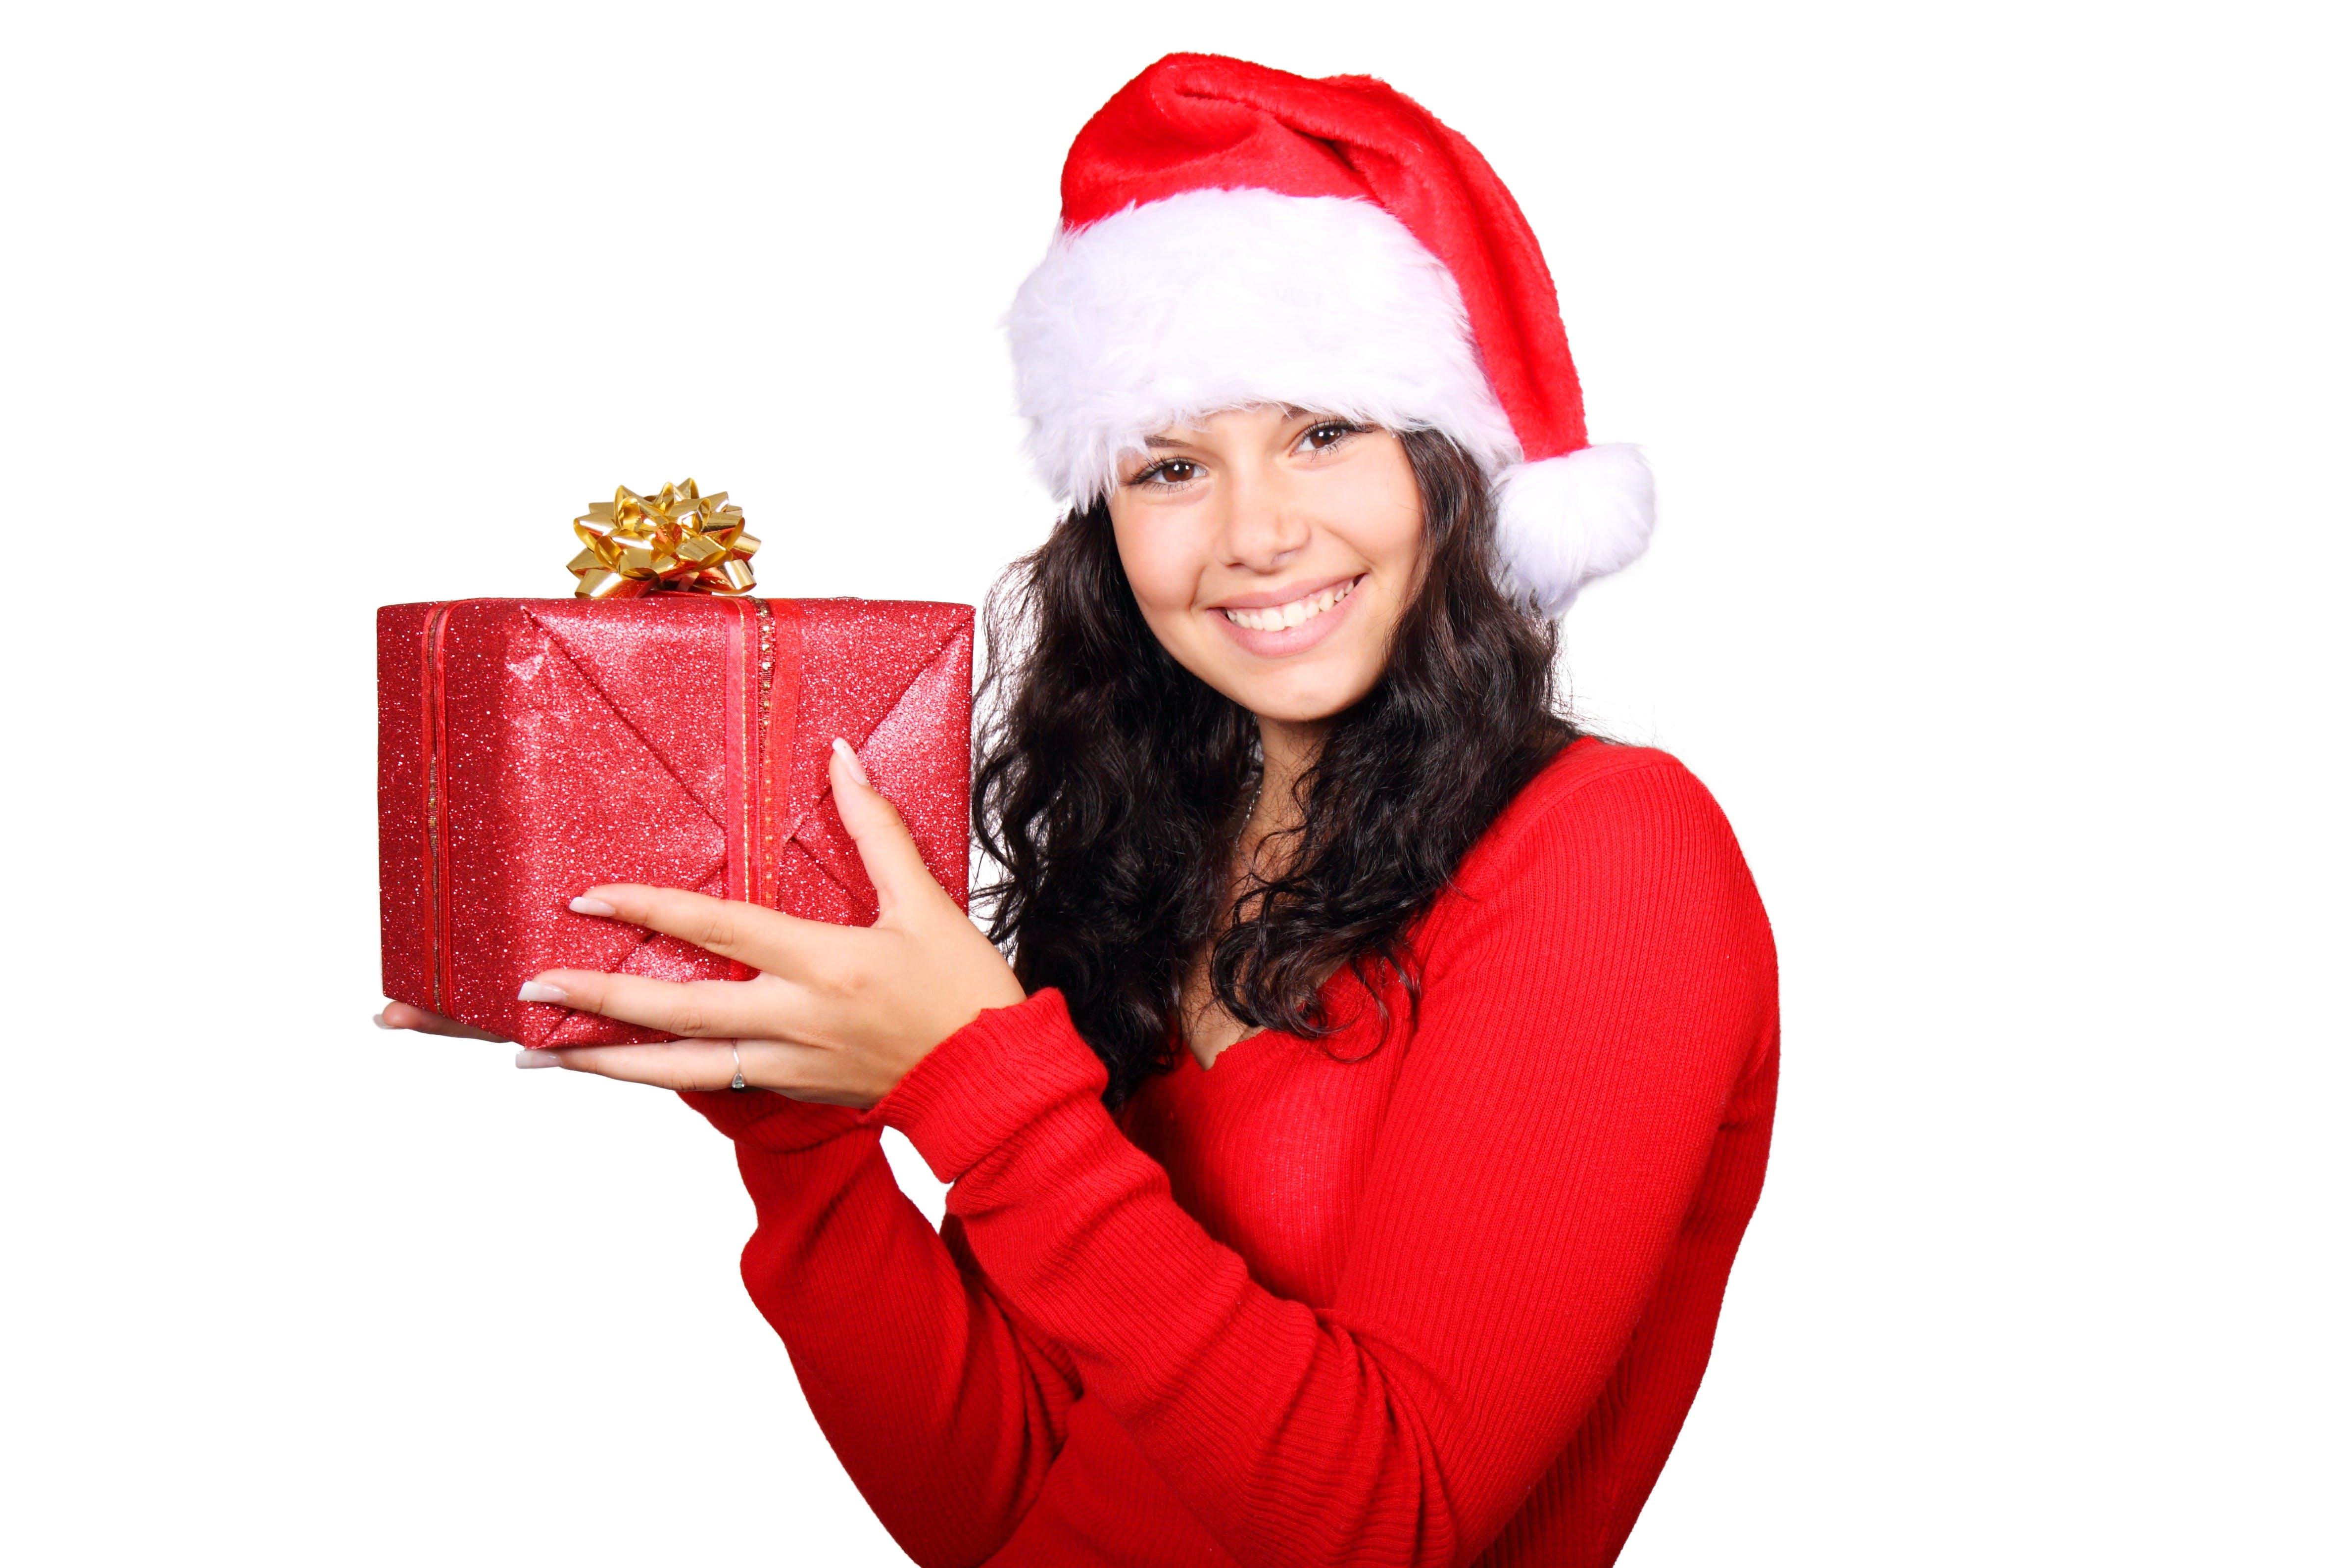 Girl Holding Red Gift Box